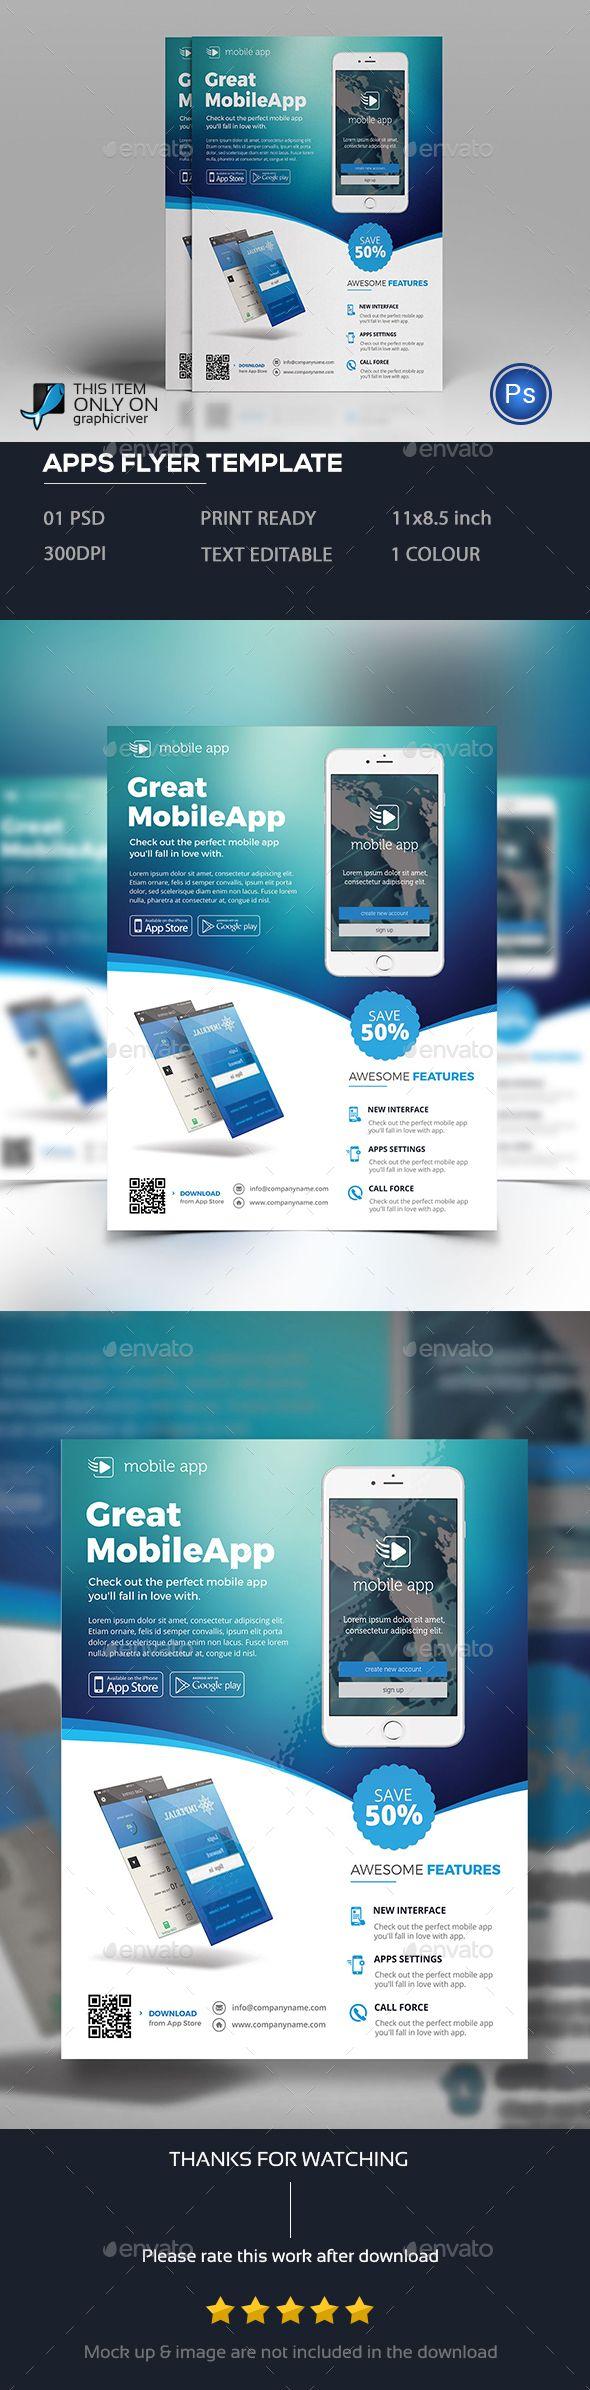 #Apps Flyer - Commerce Flyers Download here: https://graphicriver.net/item/apps-flyer/15930295?ref=alena994